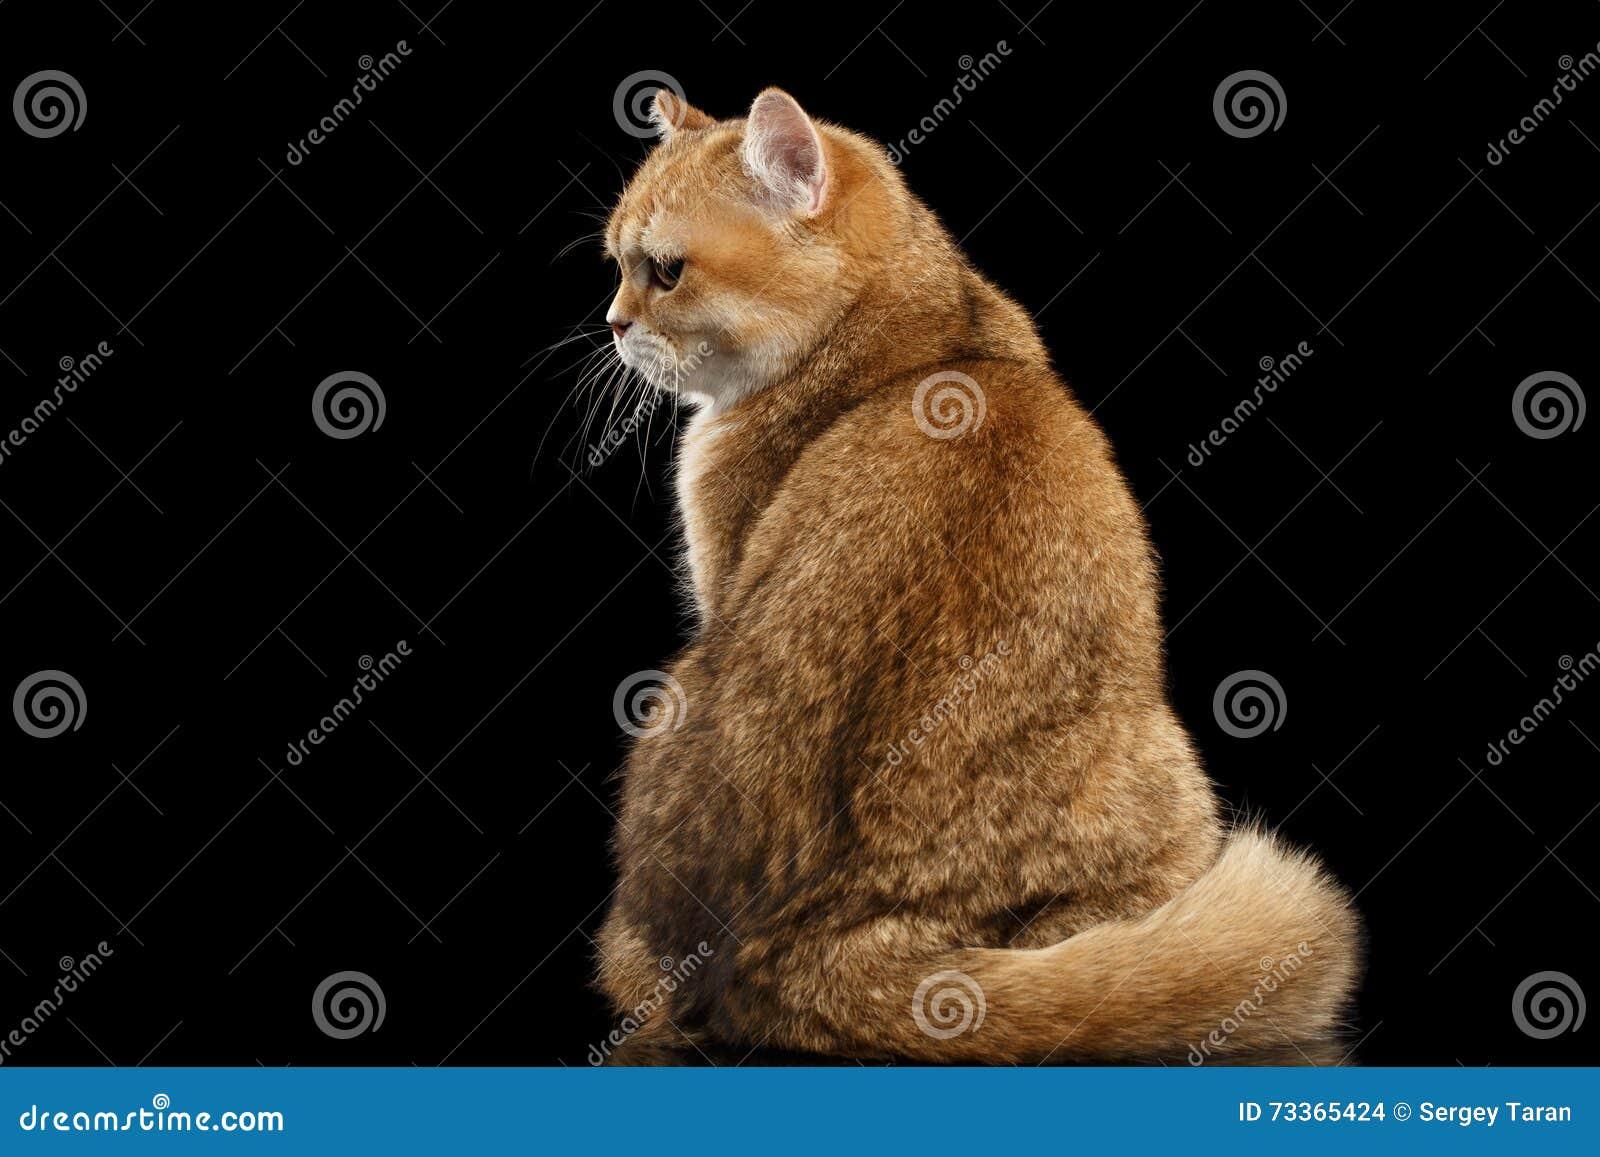 Feta brittiska Cat Gold Chinchilla Sitting Back, vresig svart